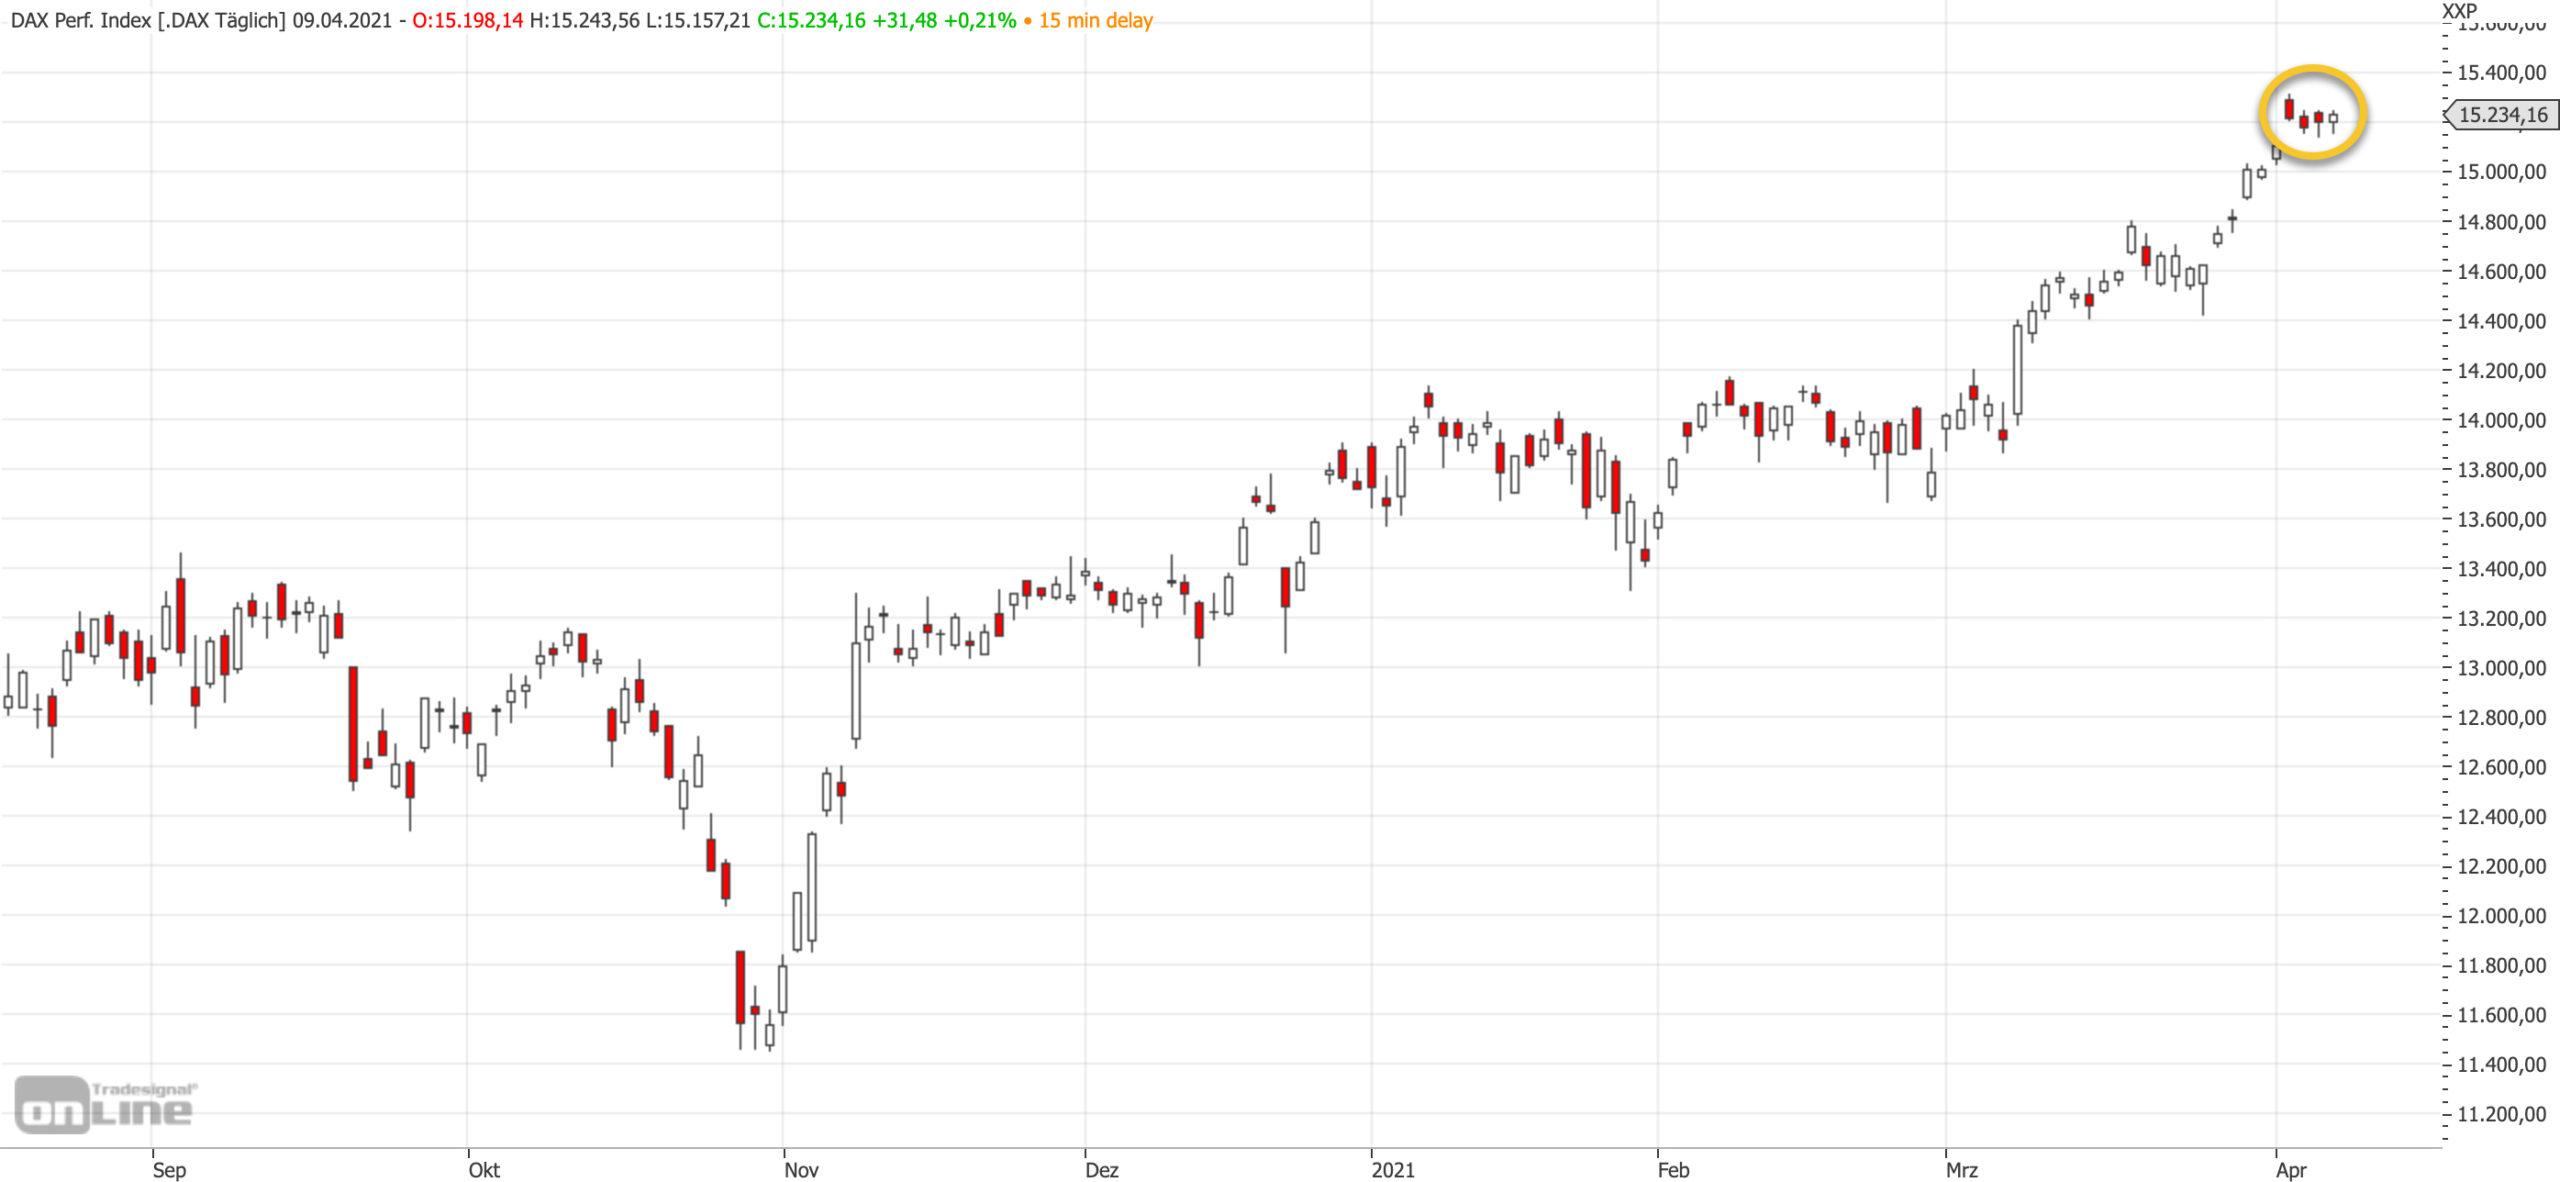 Mittelfristiger DAX-Chart am 09.04.2021